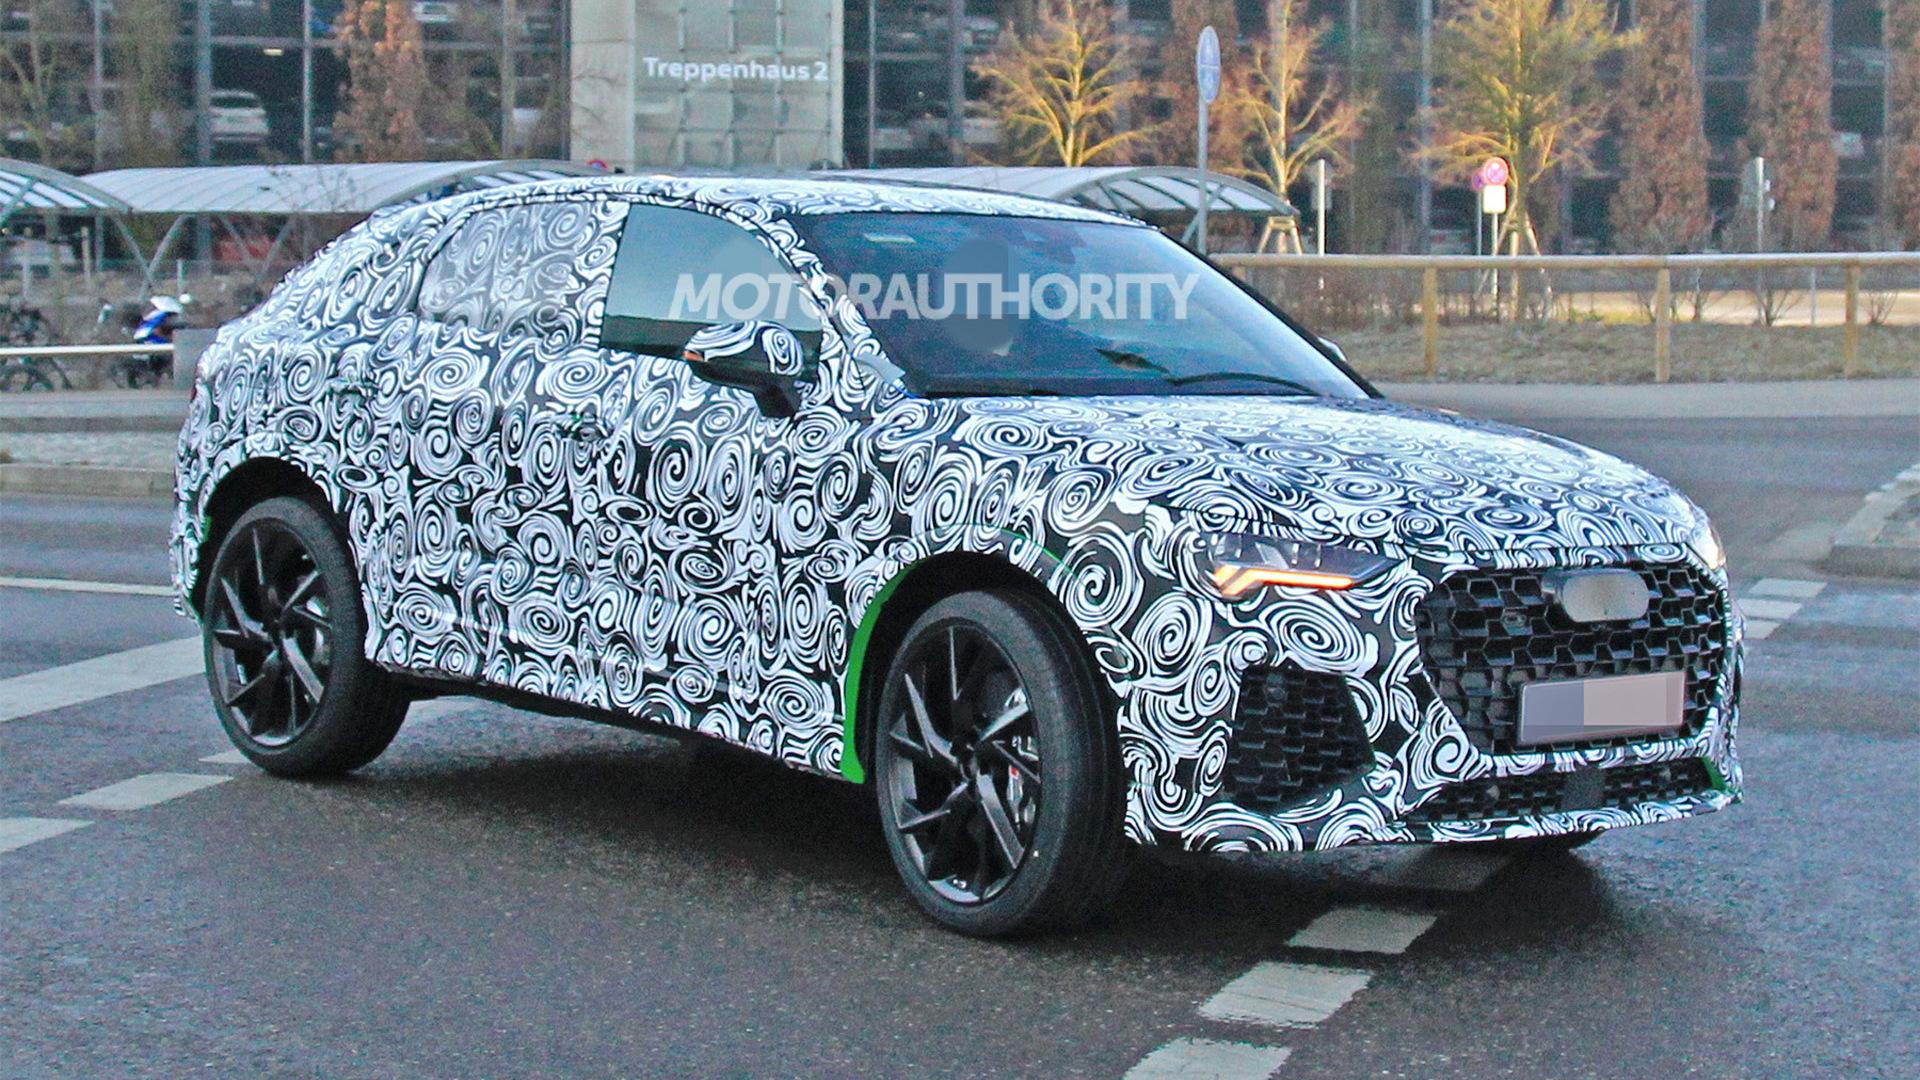 2021 Audi RS Q3 Sportback spy shots - Image via S. Baldauf/SB-Medien